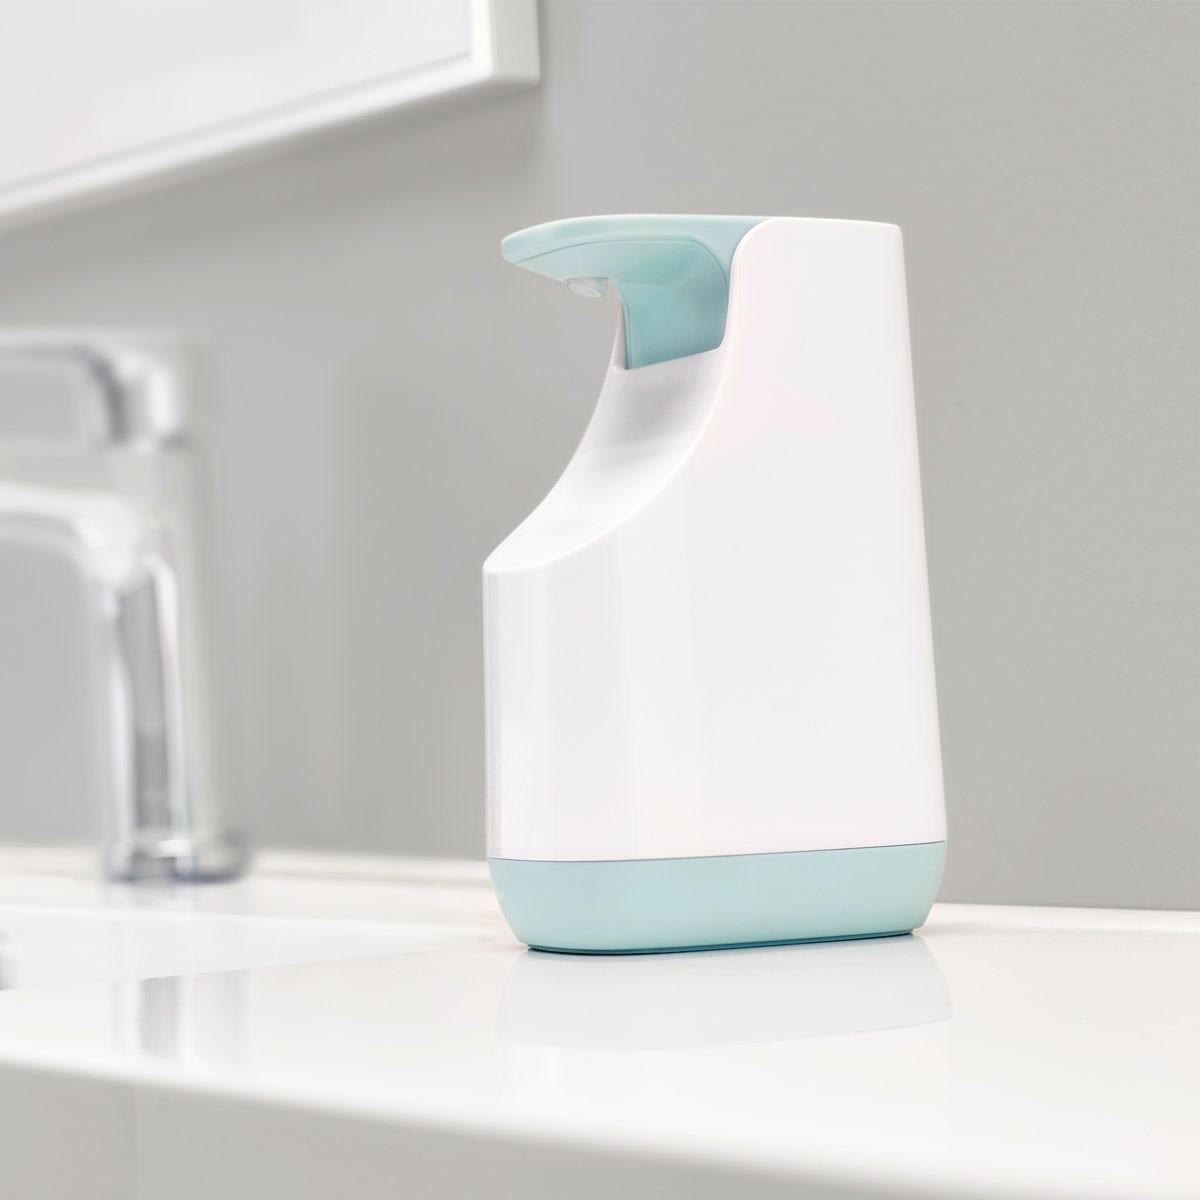 Joseph Joseph Slim compact soap dispenser